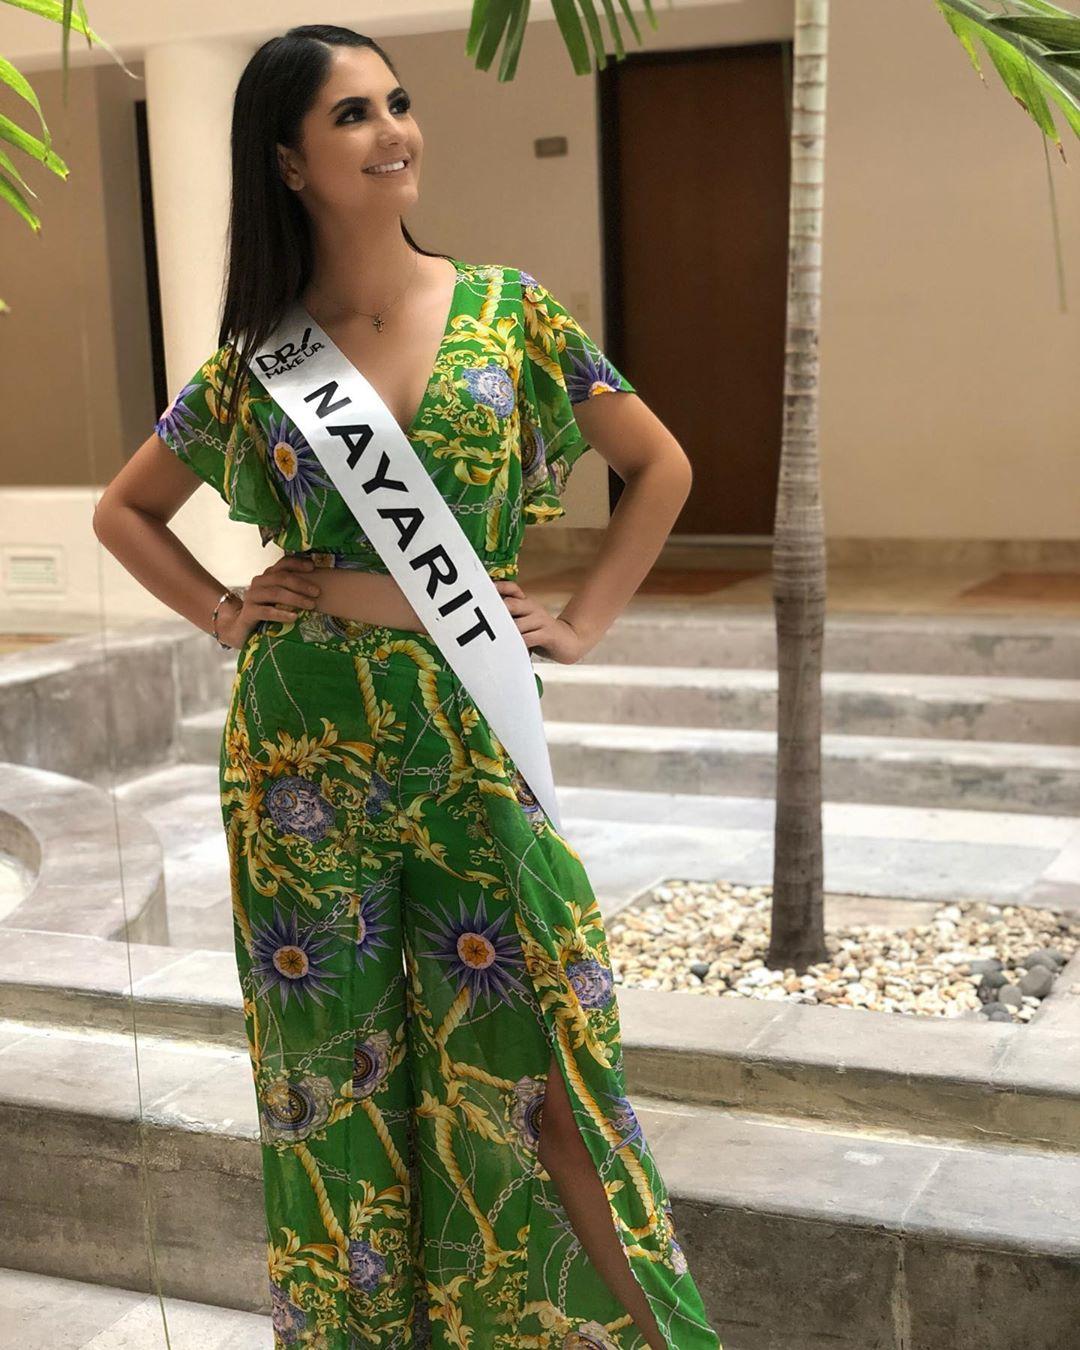 hilary islas, miss earth mexico 2019. - Página 6 60319610